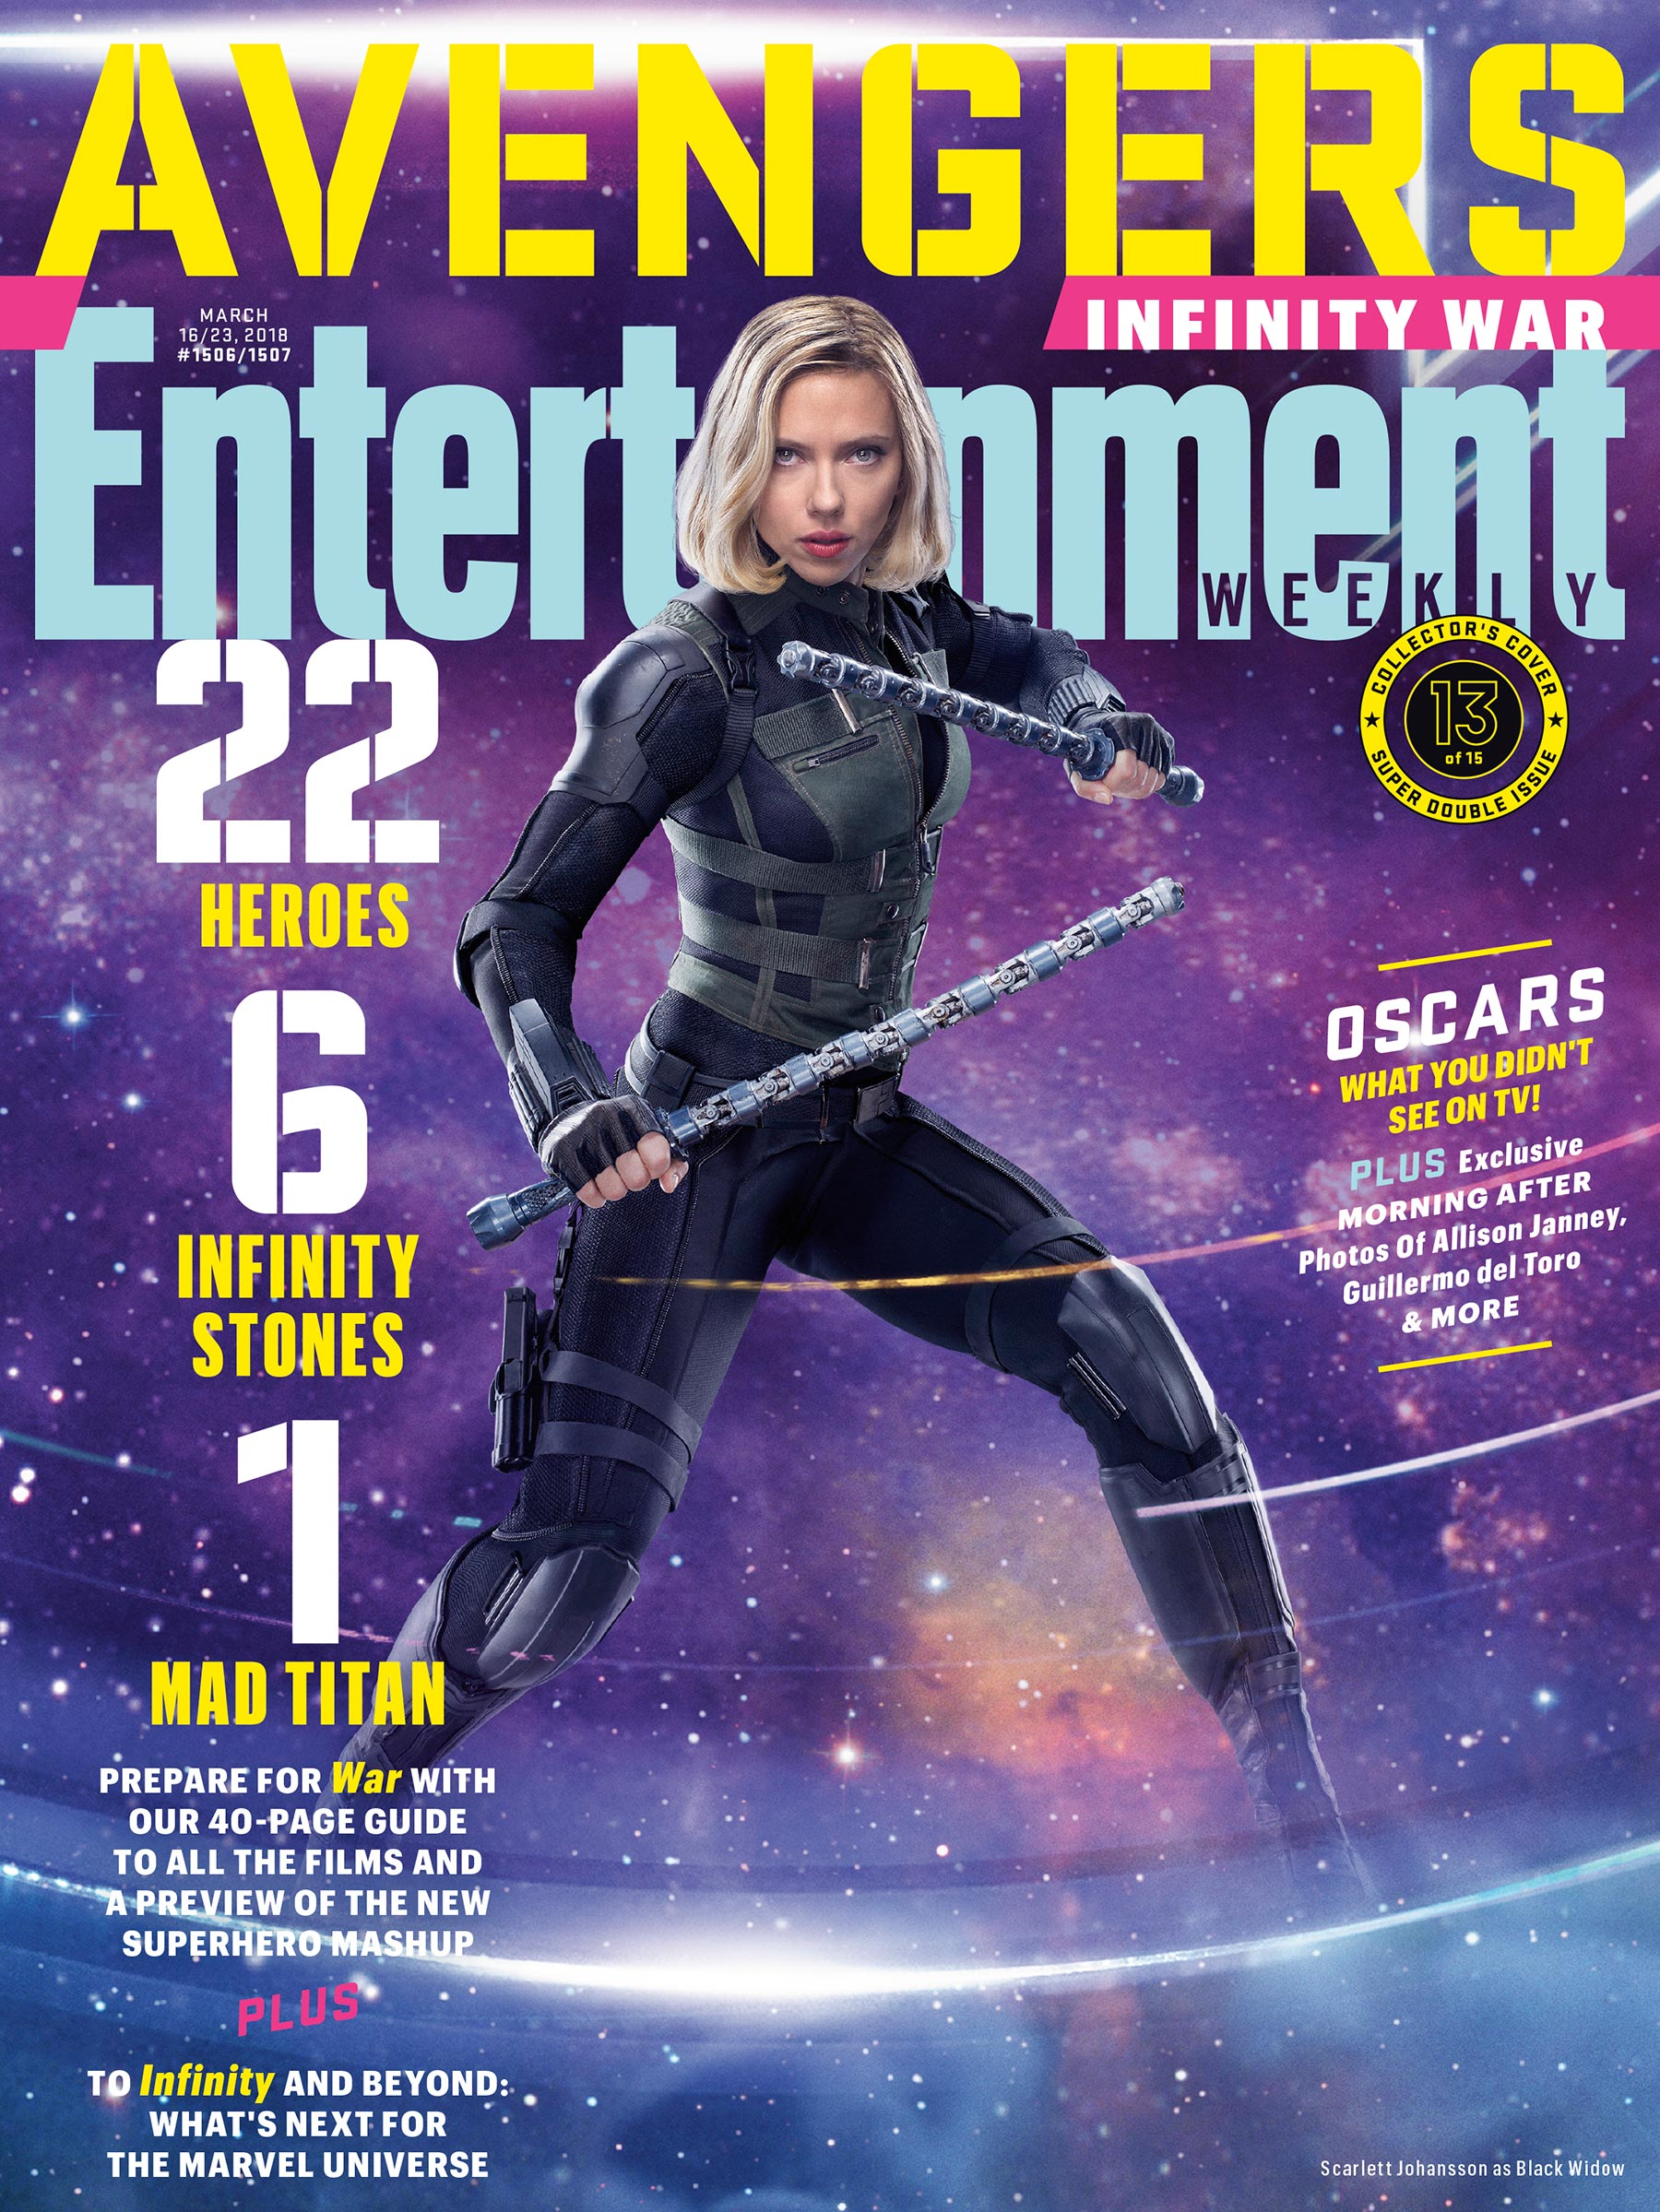 13-ewcover-avengers-black-widow